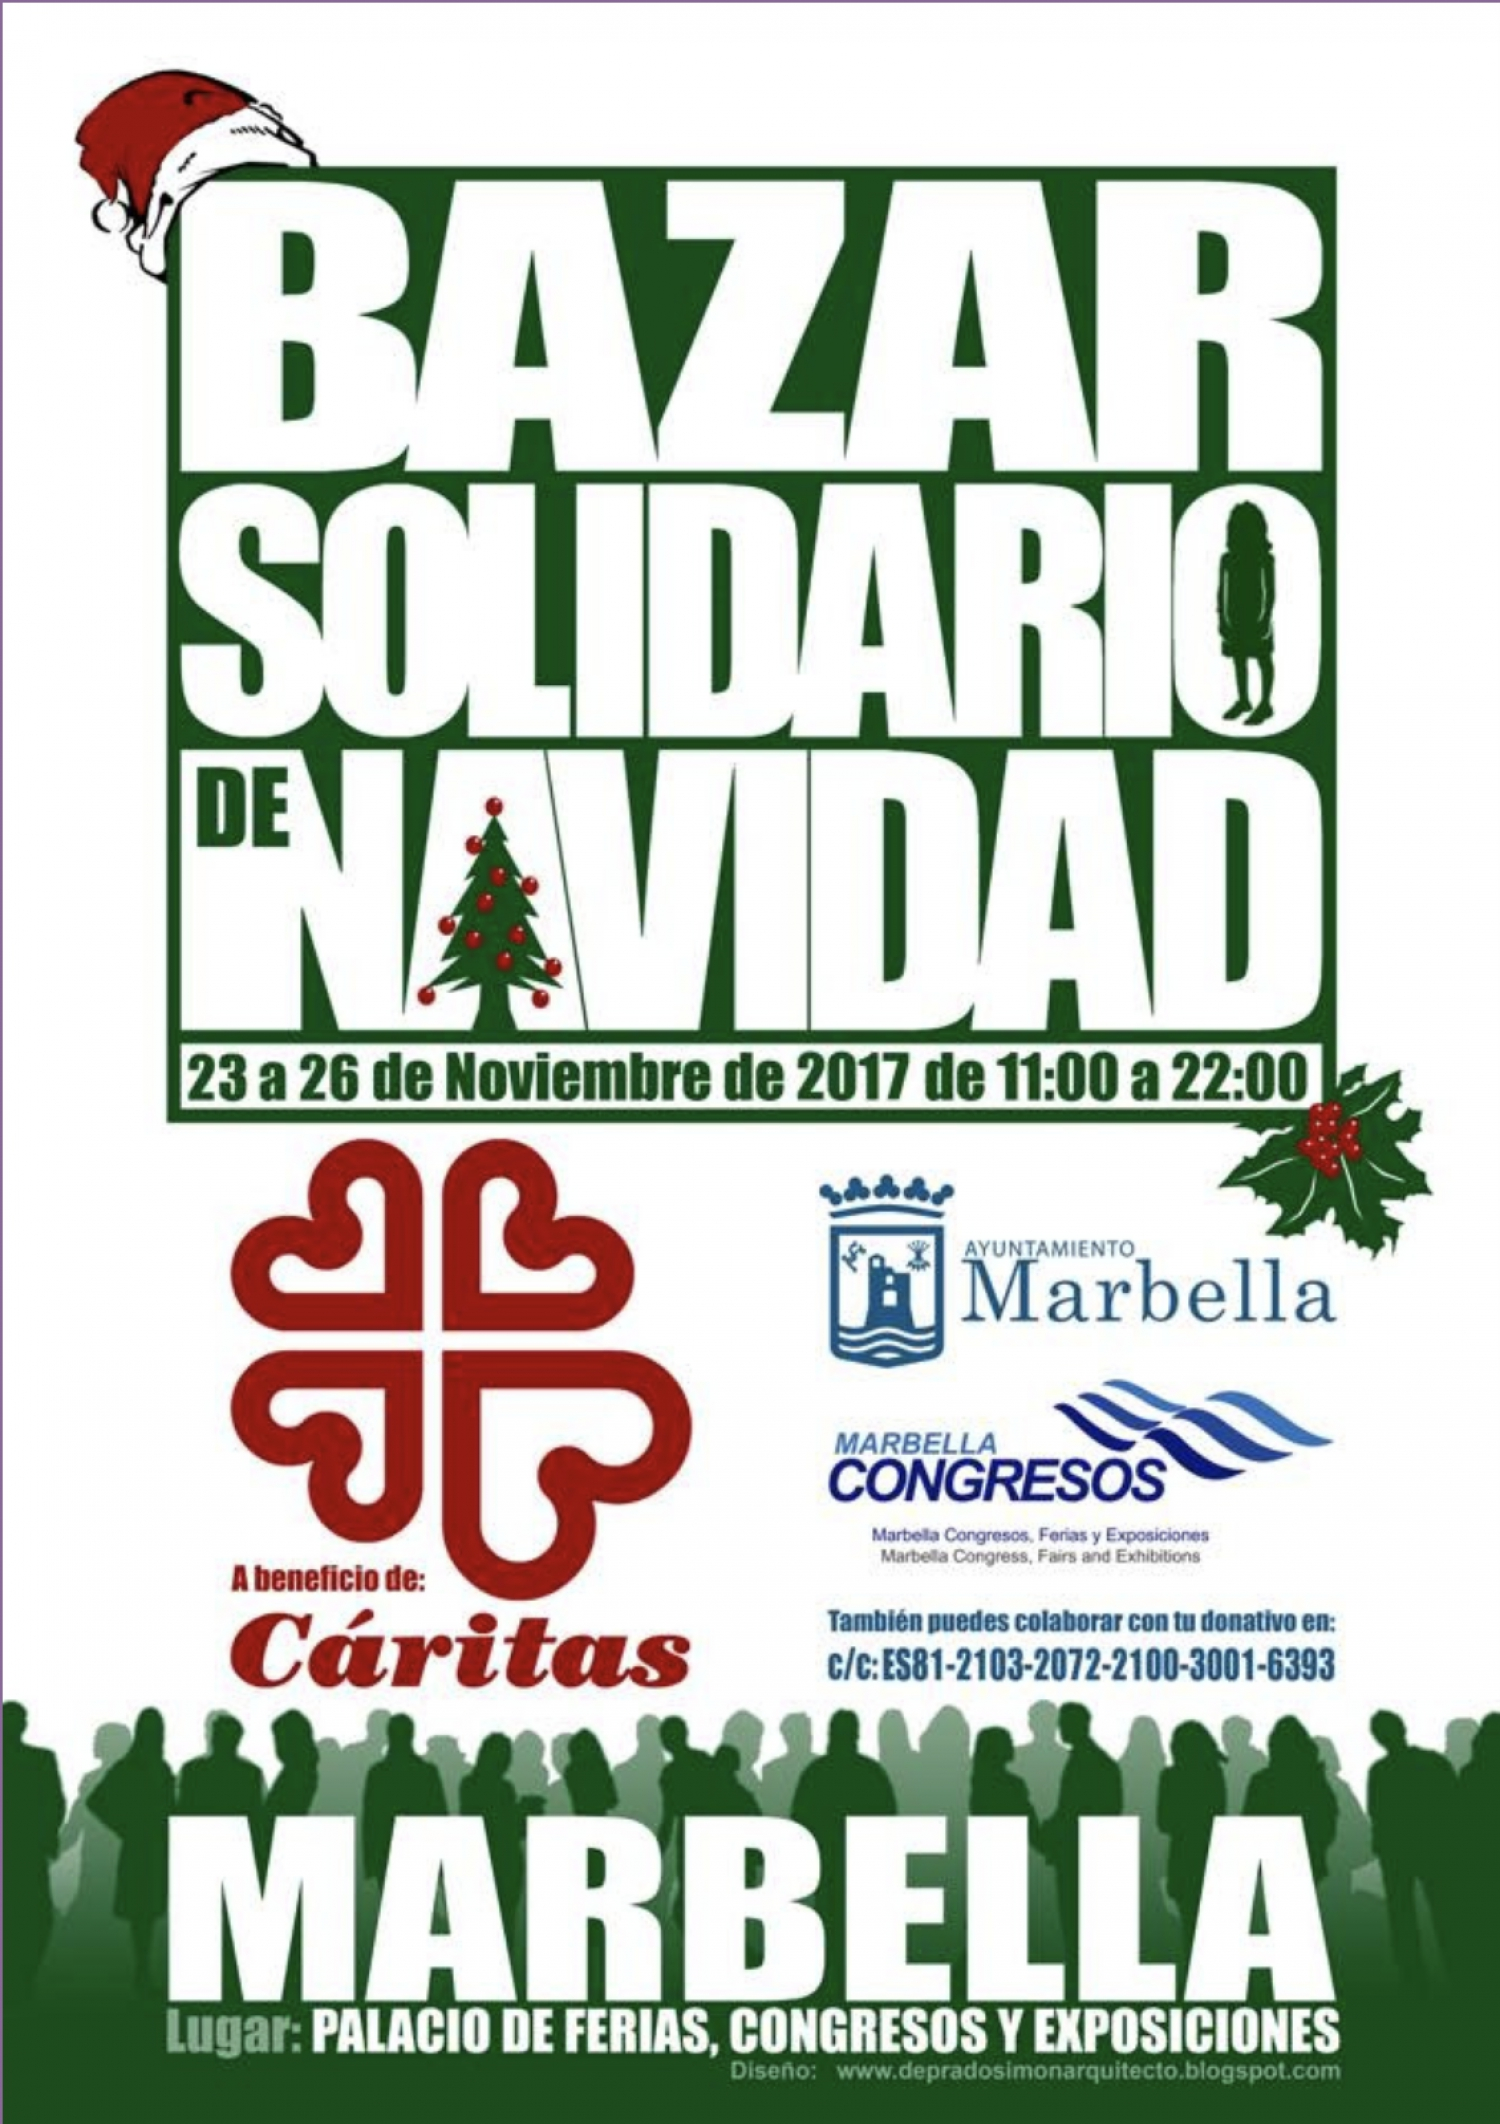 Caritas 2017 Christmas Market